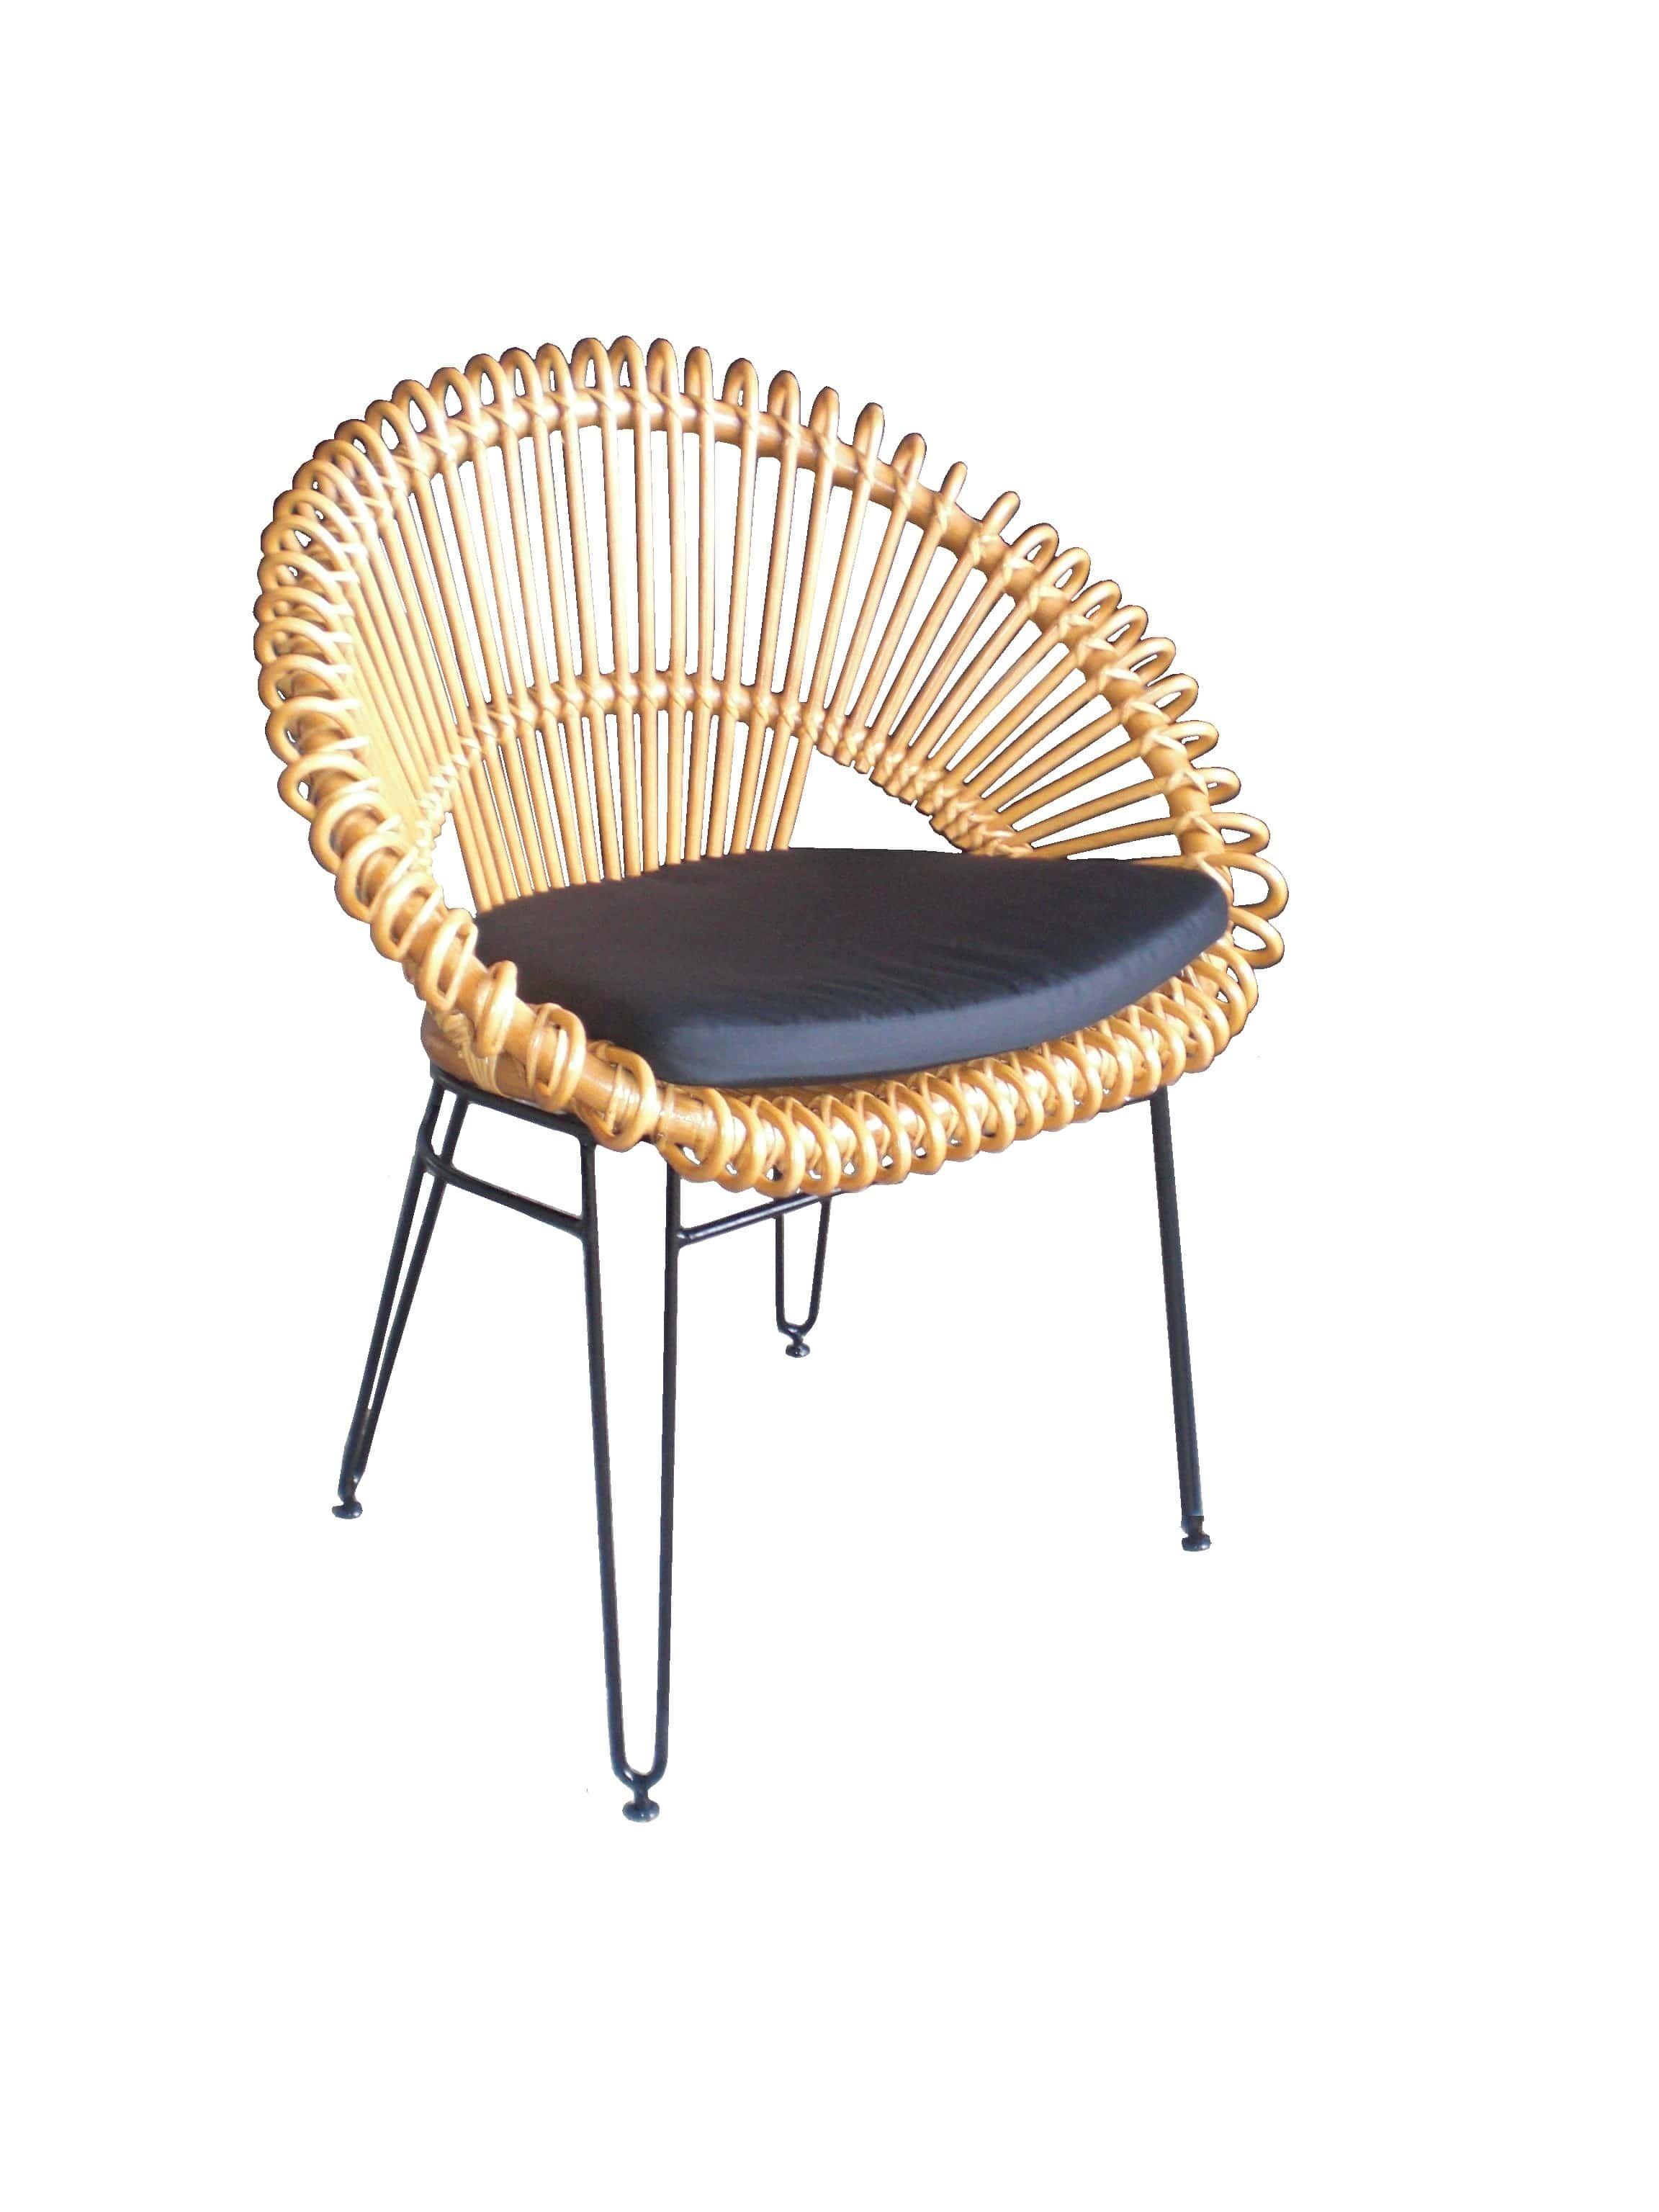 Wicker Circle Chair Bamboo Circle Chair Circle Wicker Chair Round Rattan Chair With Cushion When It Comes To Shoppin Bamboo Chair Furniture Chair Circle Chair